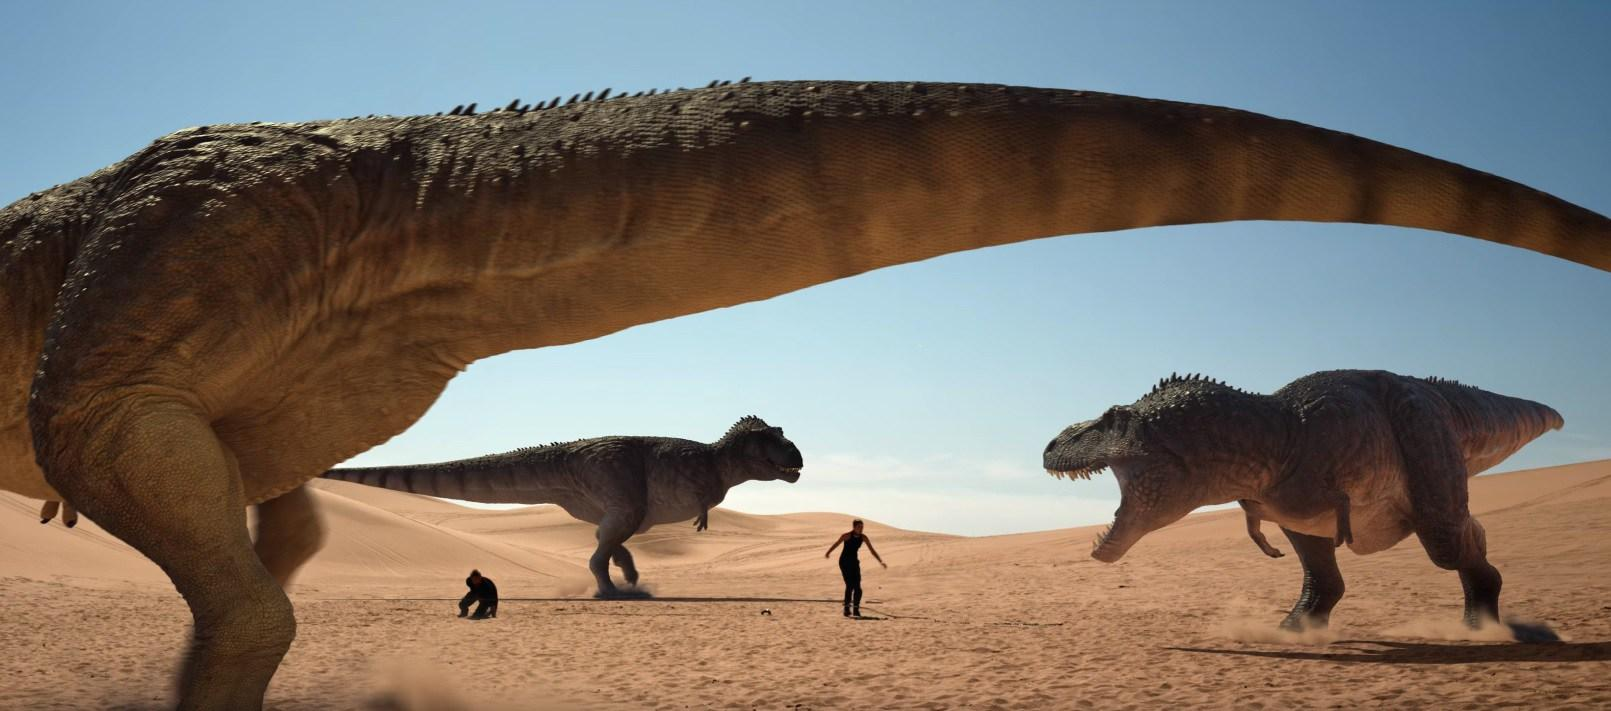 فيلم The Jurassic Games 2018 مترجم